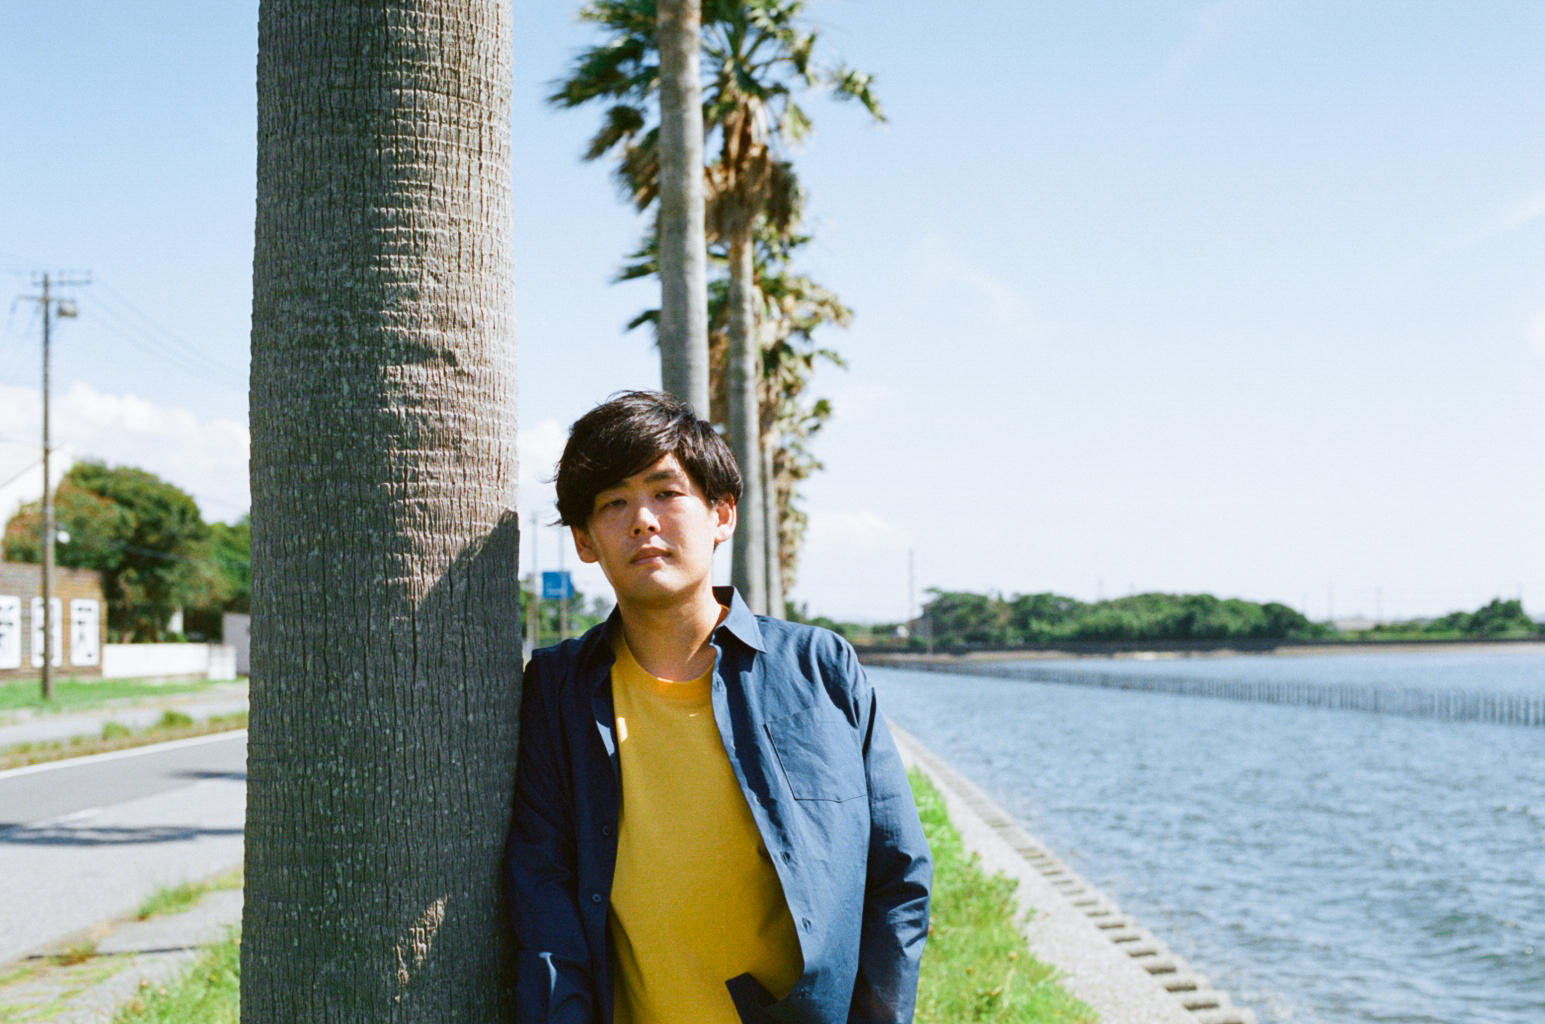 Live : STUTS / Band : 仰木亮彦(Gt.)/ 高橋佑成(Pf, Rhodes etc.) / nakayaan(Ba) / MC.sirafu(tp) / Guest : asuka ando / Campanella / C.O.S.A. / Daichi Yamamoto / JJJ / KID FRESINO / 鎮座DOPENESS / 一十三十一